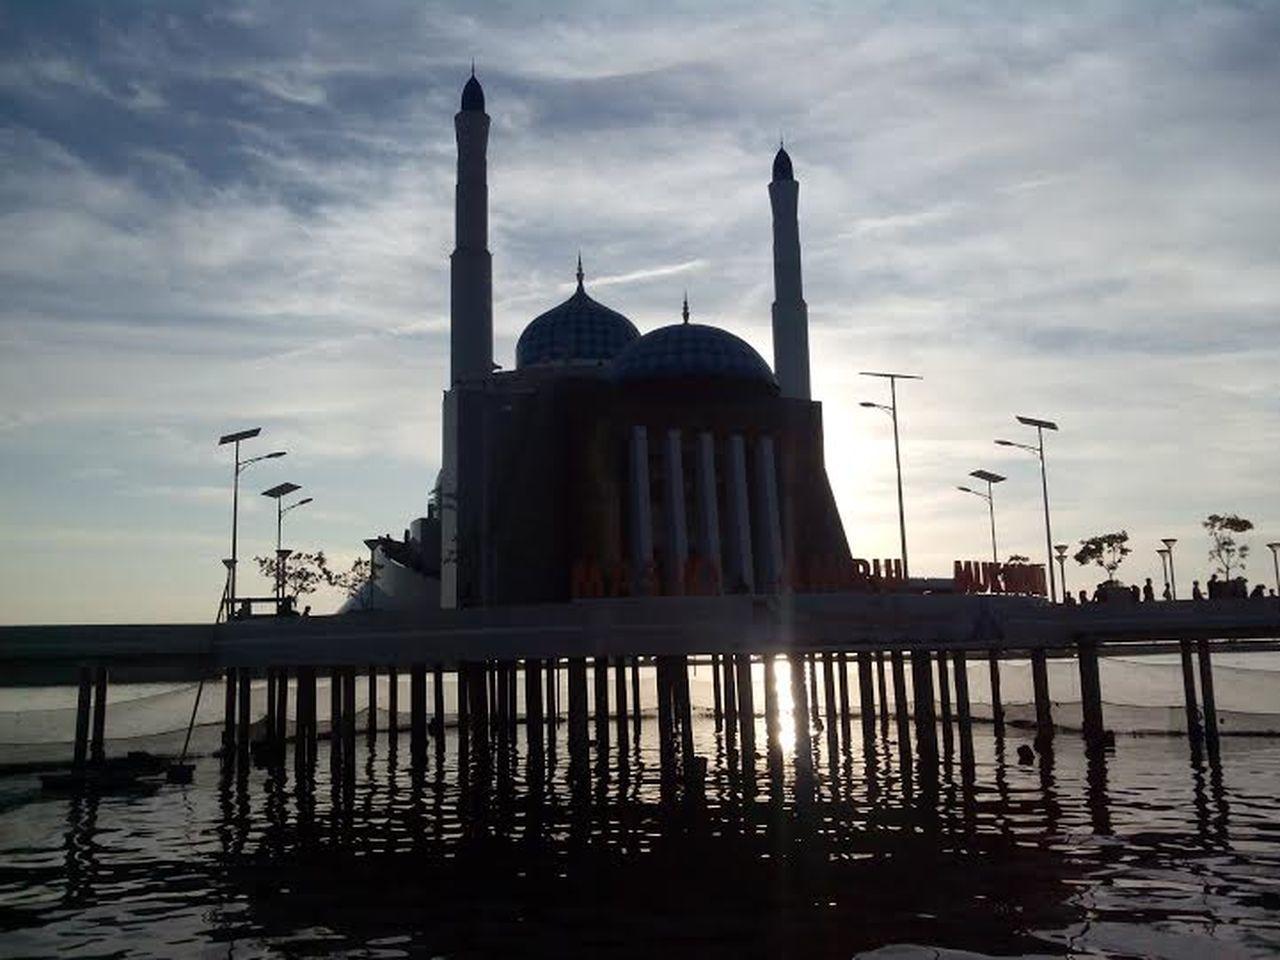 Masjid Amirul Mukminin Pantai Losari Makasar Architecture Losari Beach Masjid Moslem Mosque Mosques Mosques Of The World Silhouette